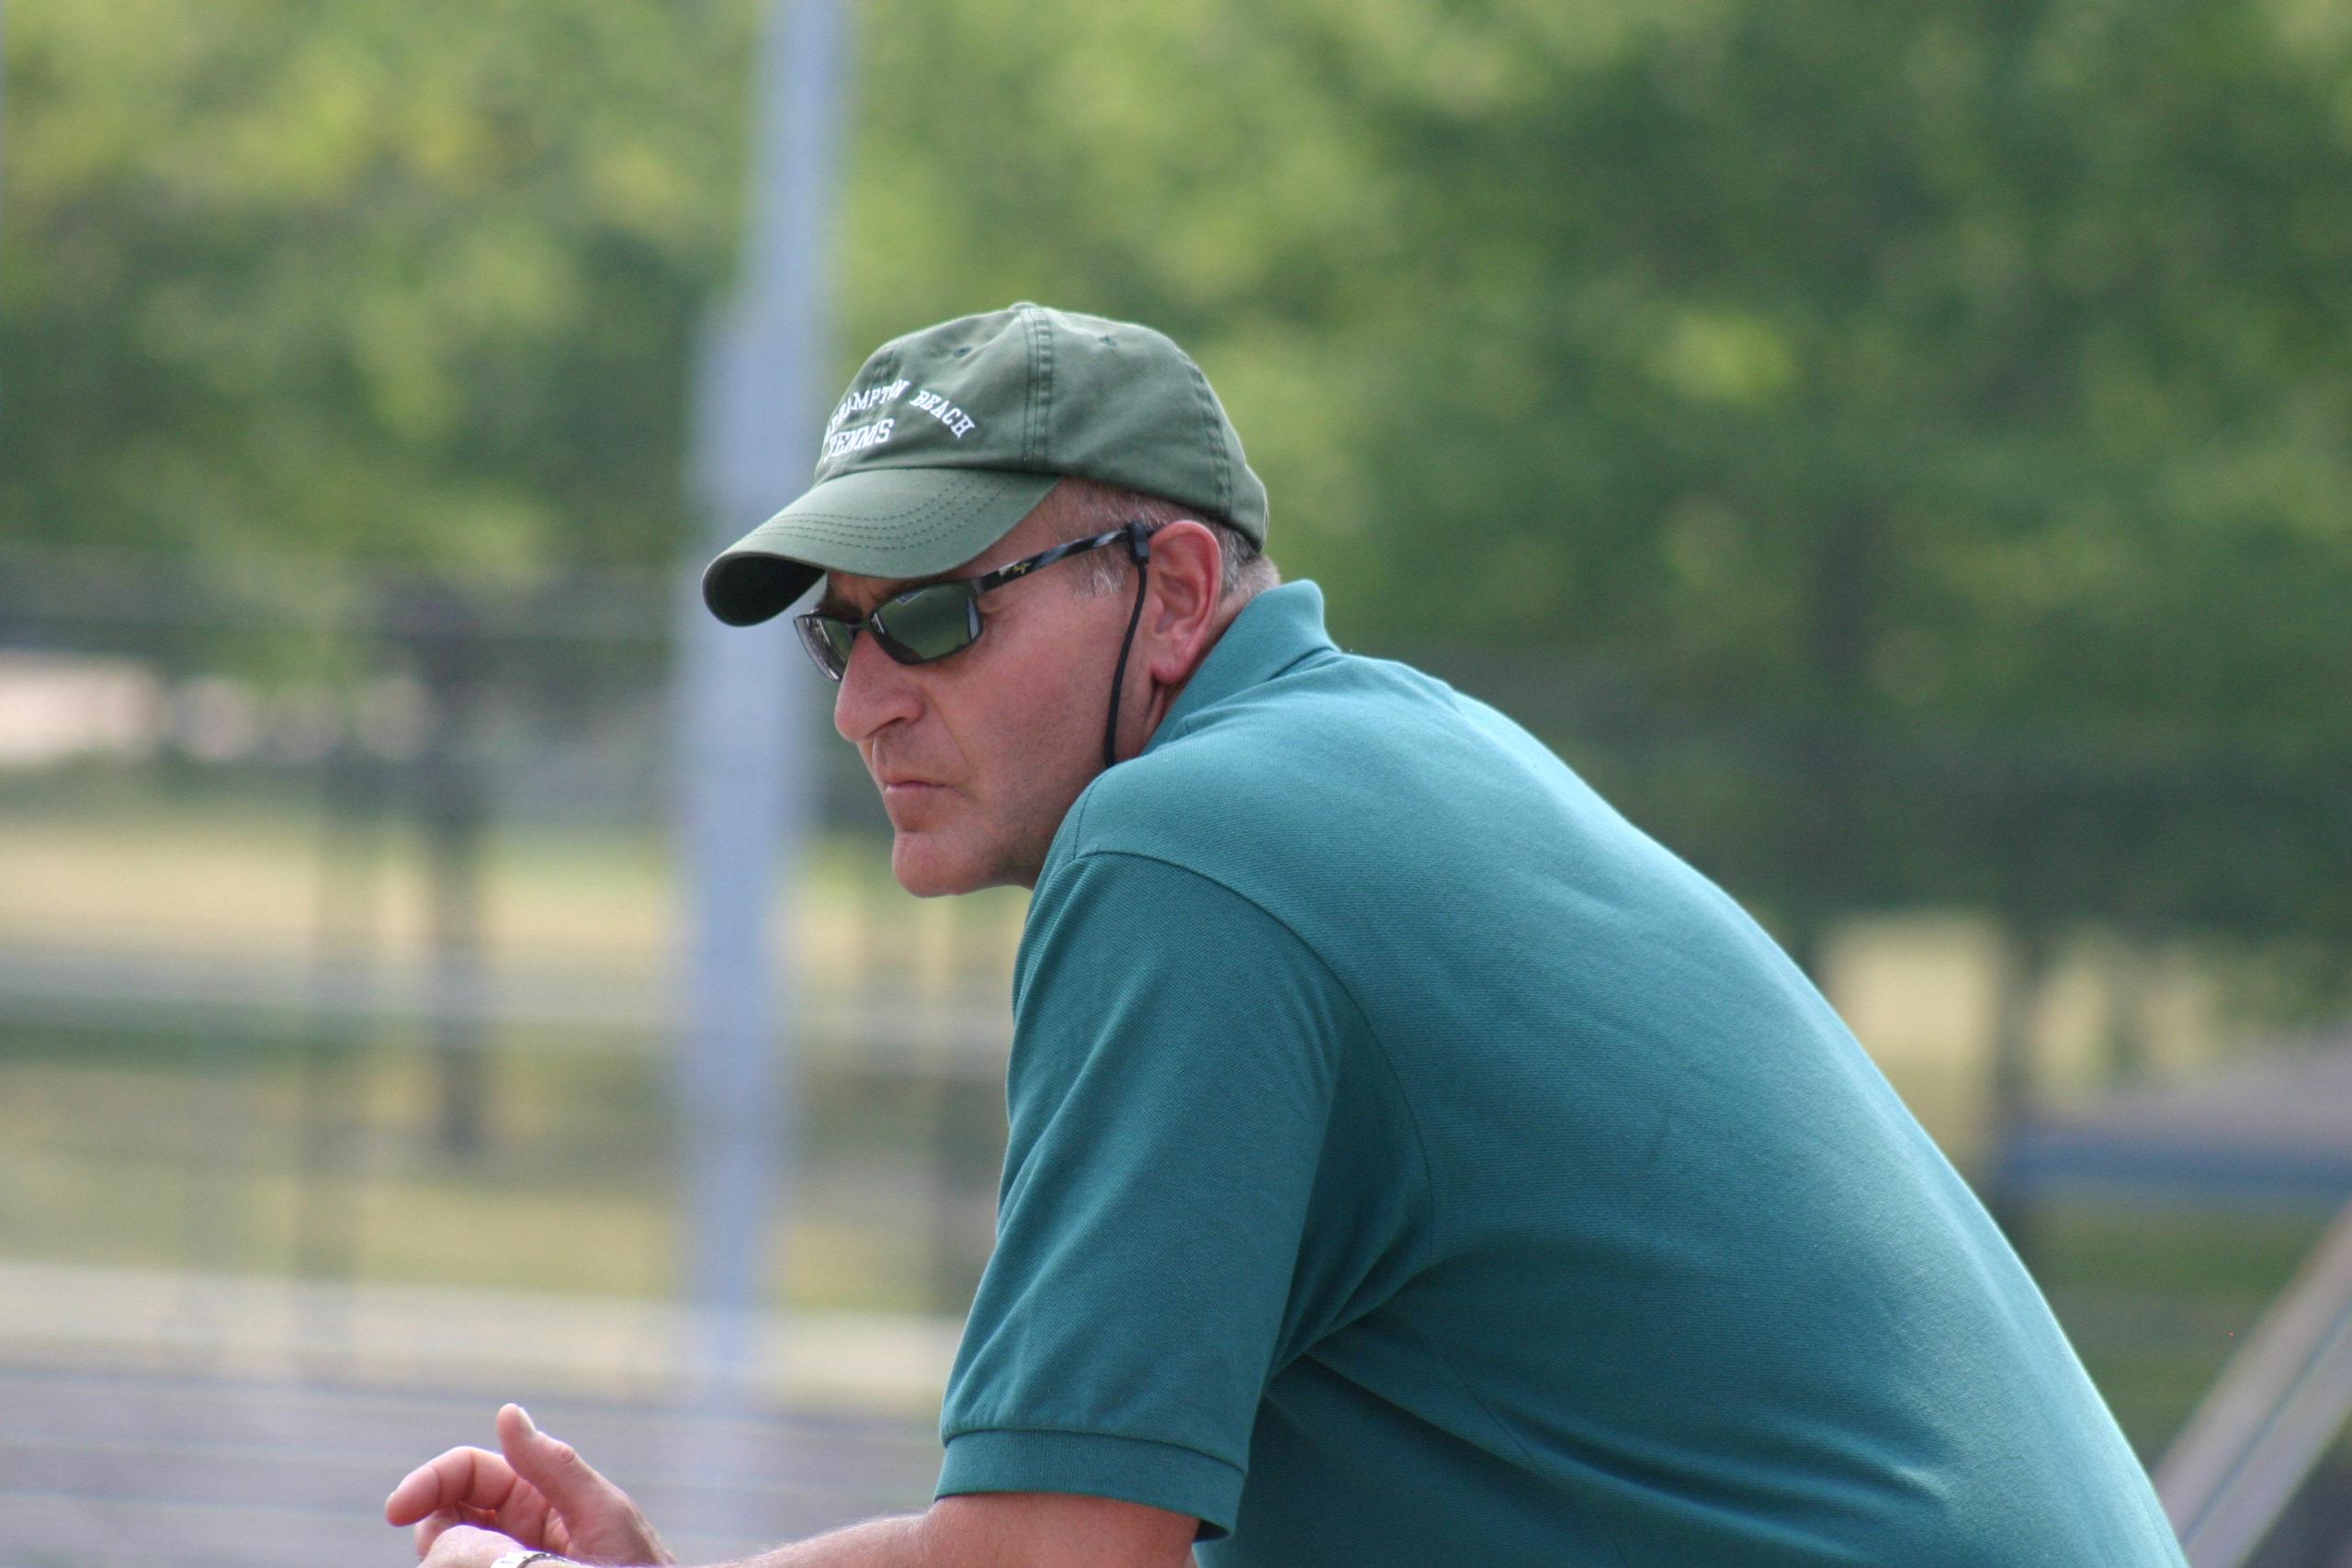 John Czartosieski will not be returning as head coach of the Westhampton Beach varsity boys and girls tennis teams.